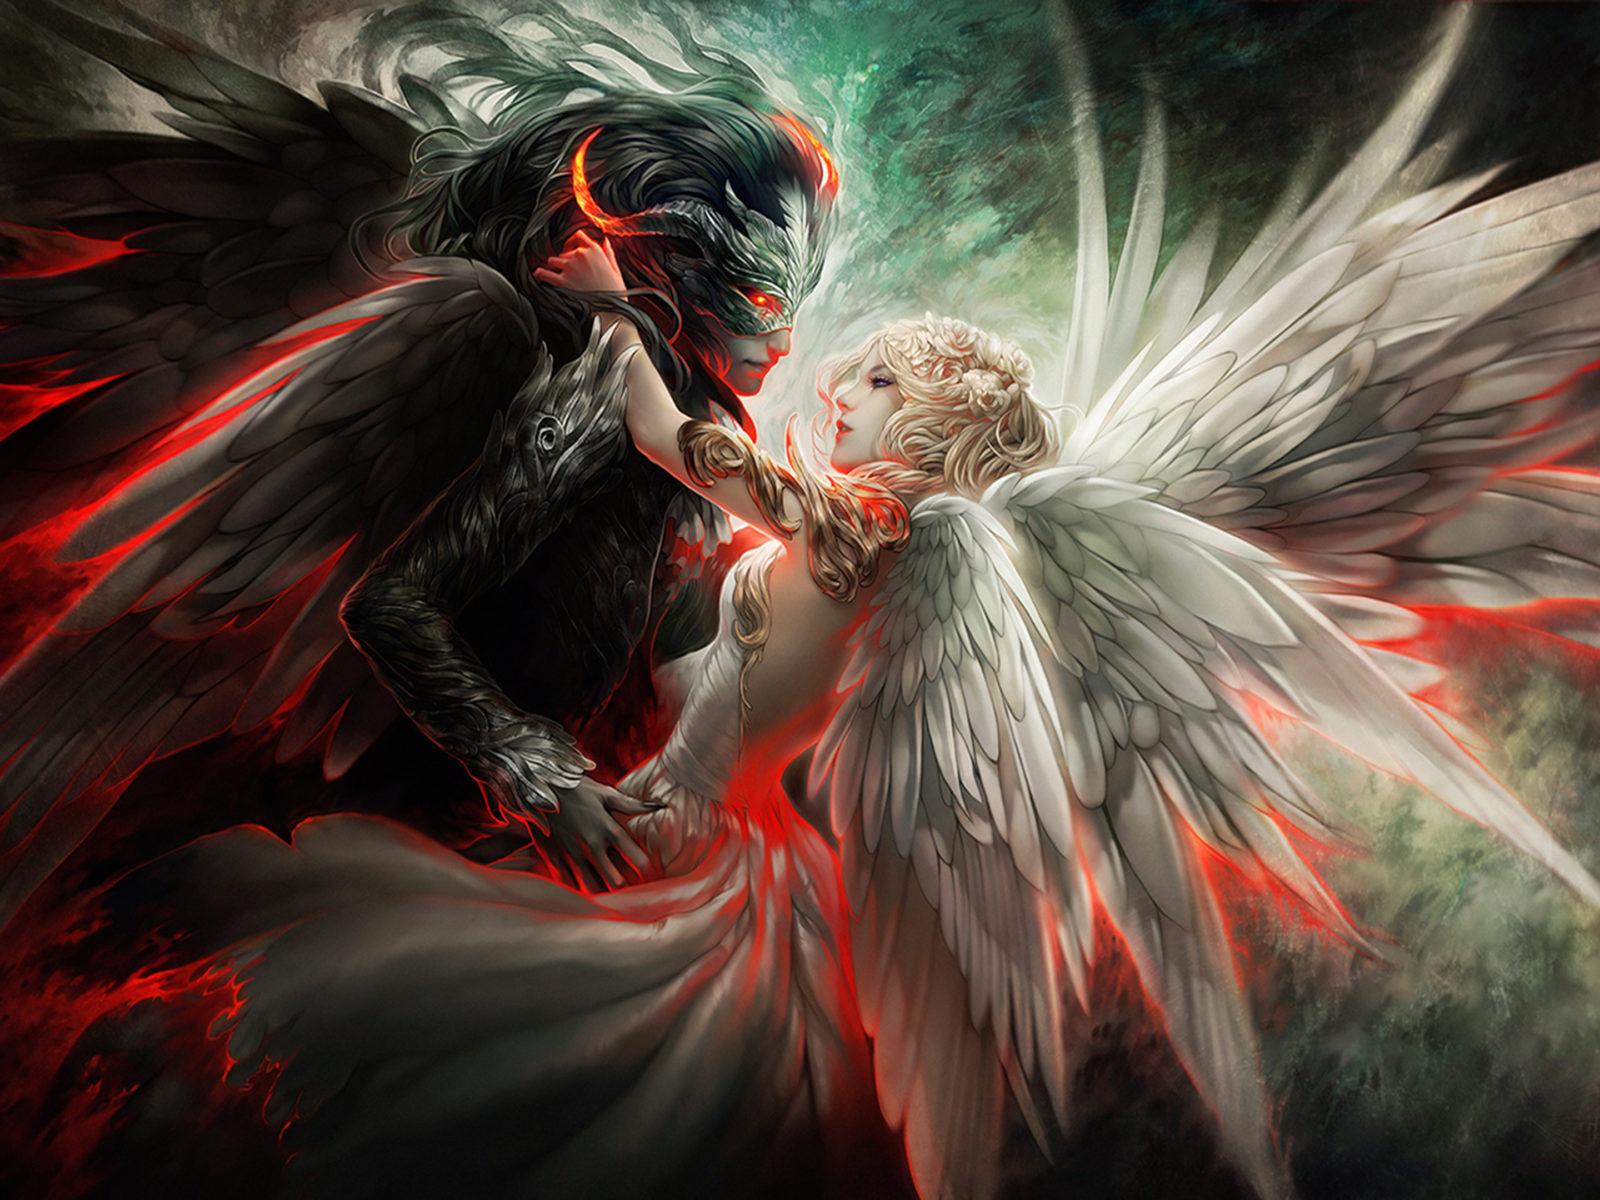 Evil Dark Fantasy Girl Wallpaper Hd Angel And Demon Mask Couple Wings Orginal Hd Wallpaper